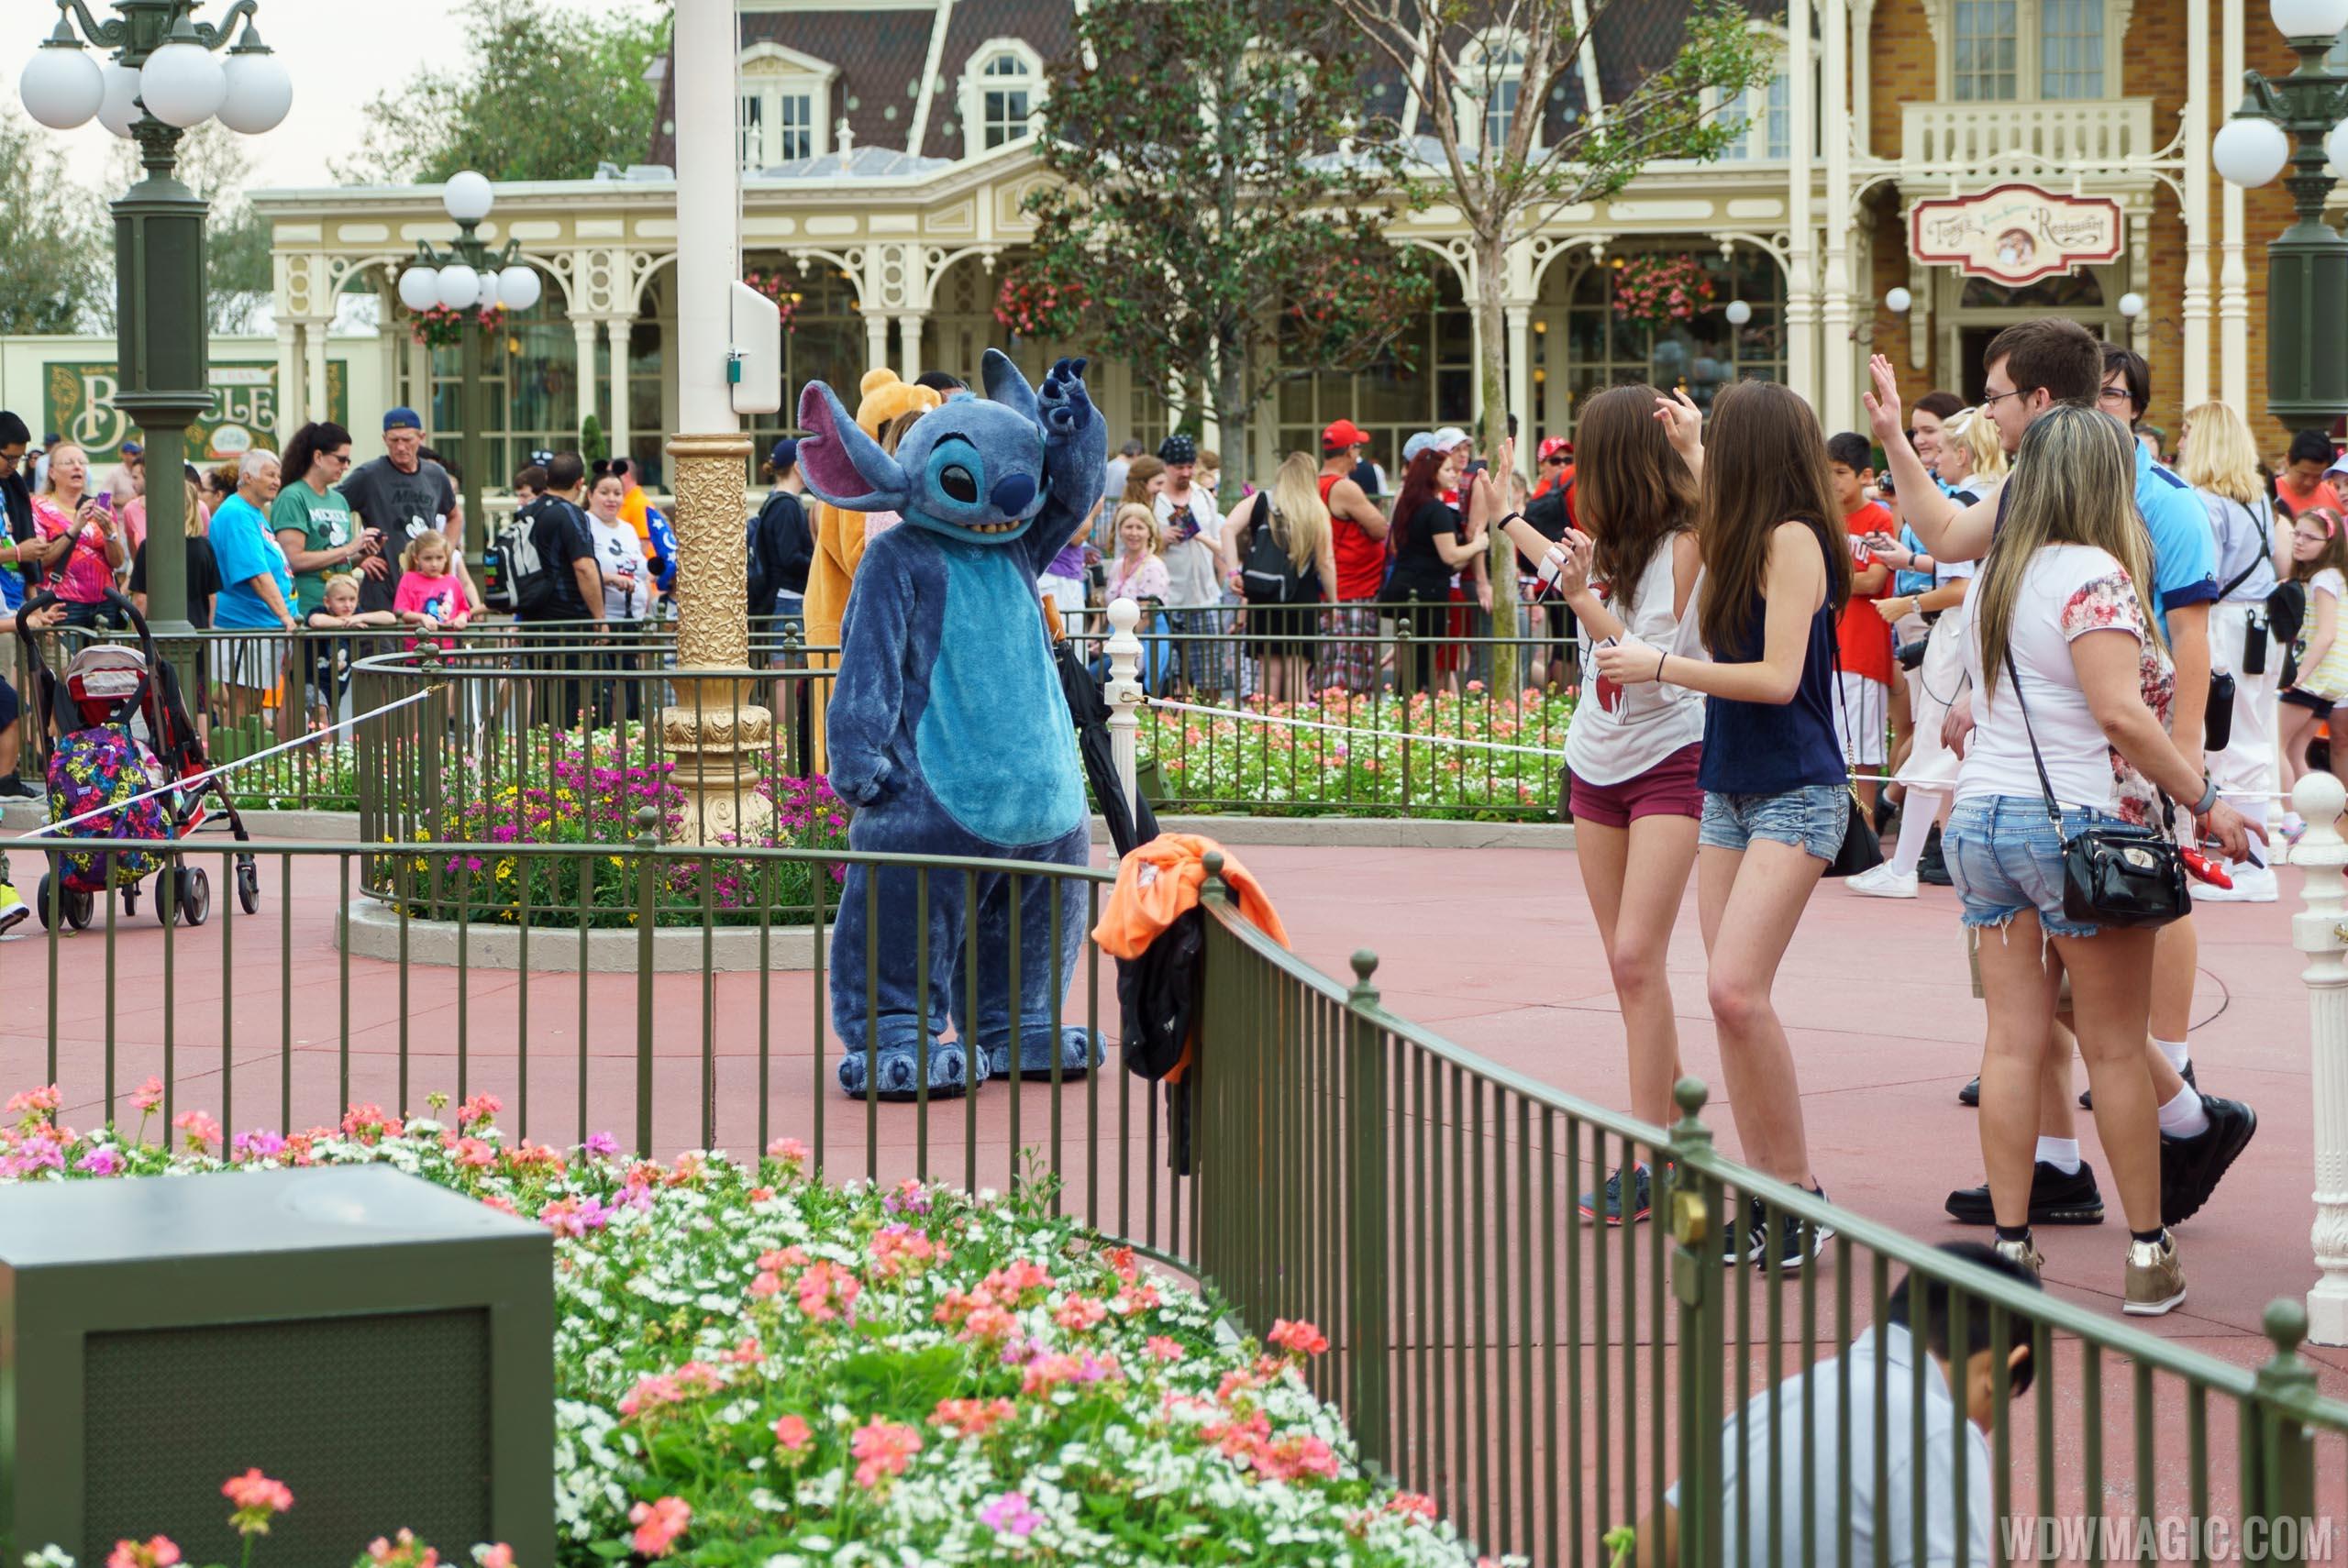 Character meet and greets at the magic kingdom stitch meet and greet in town square at the magic kingdom kristyandbryce Gallery